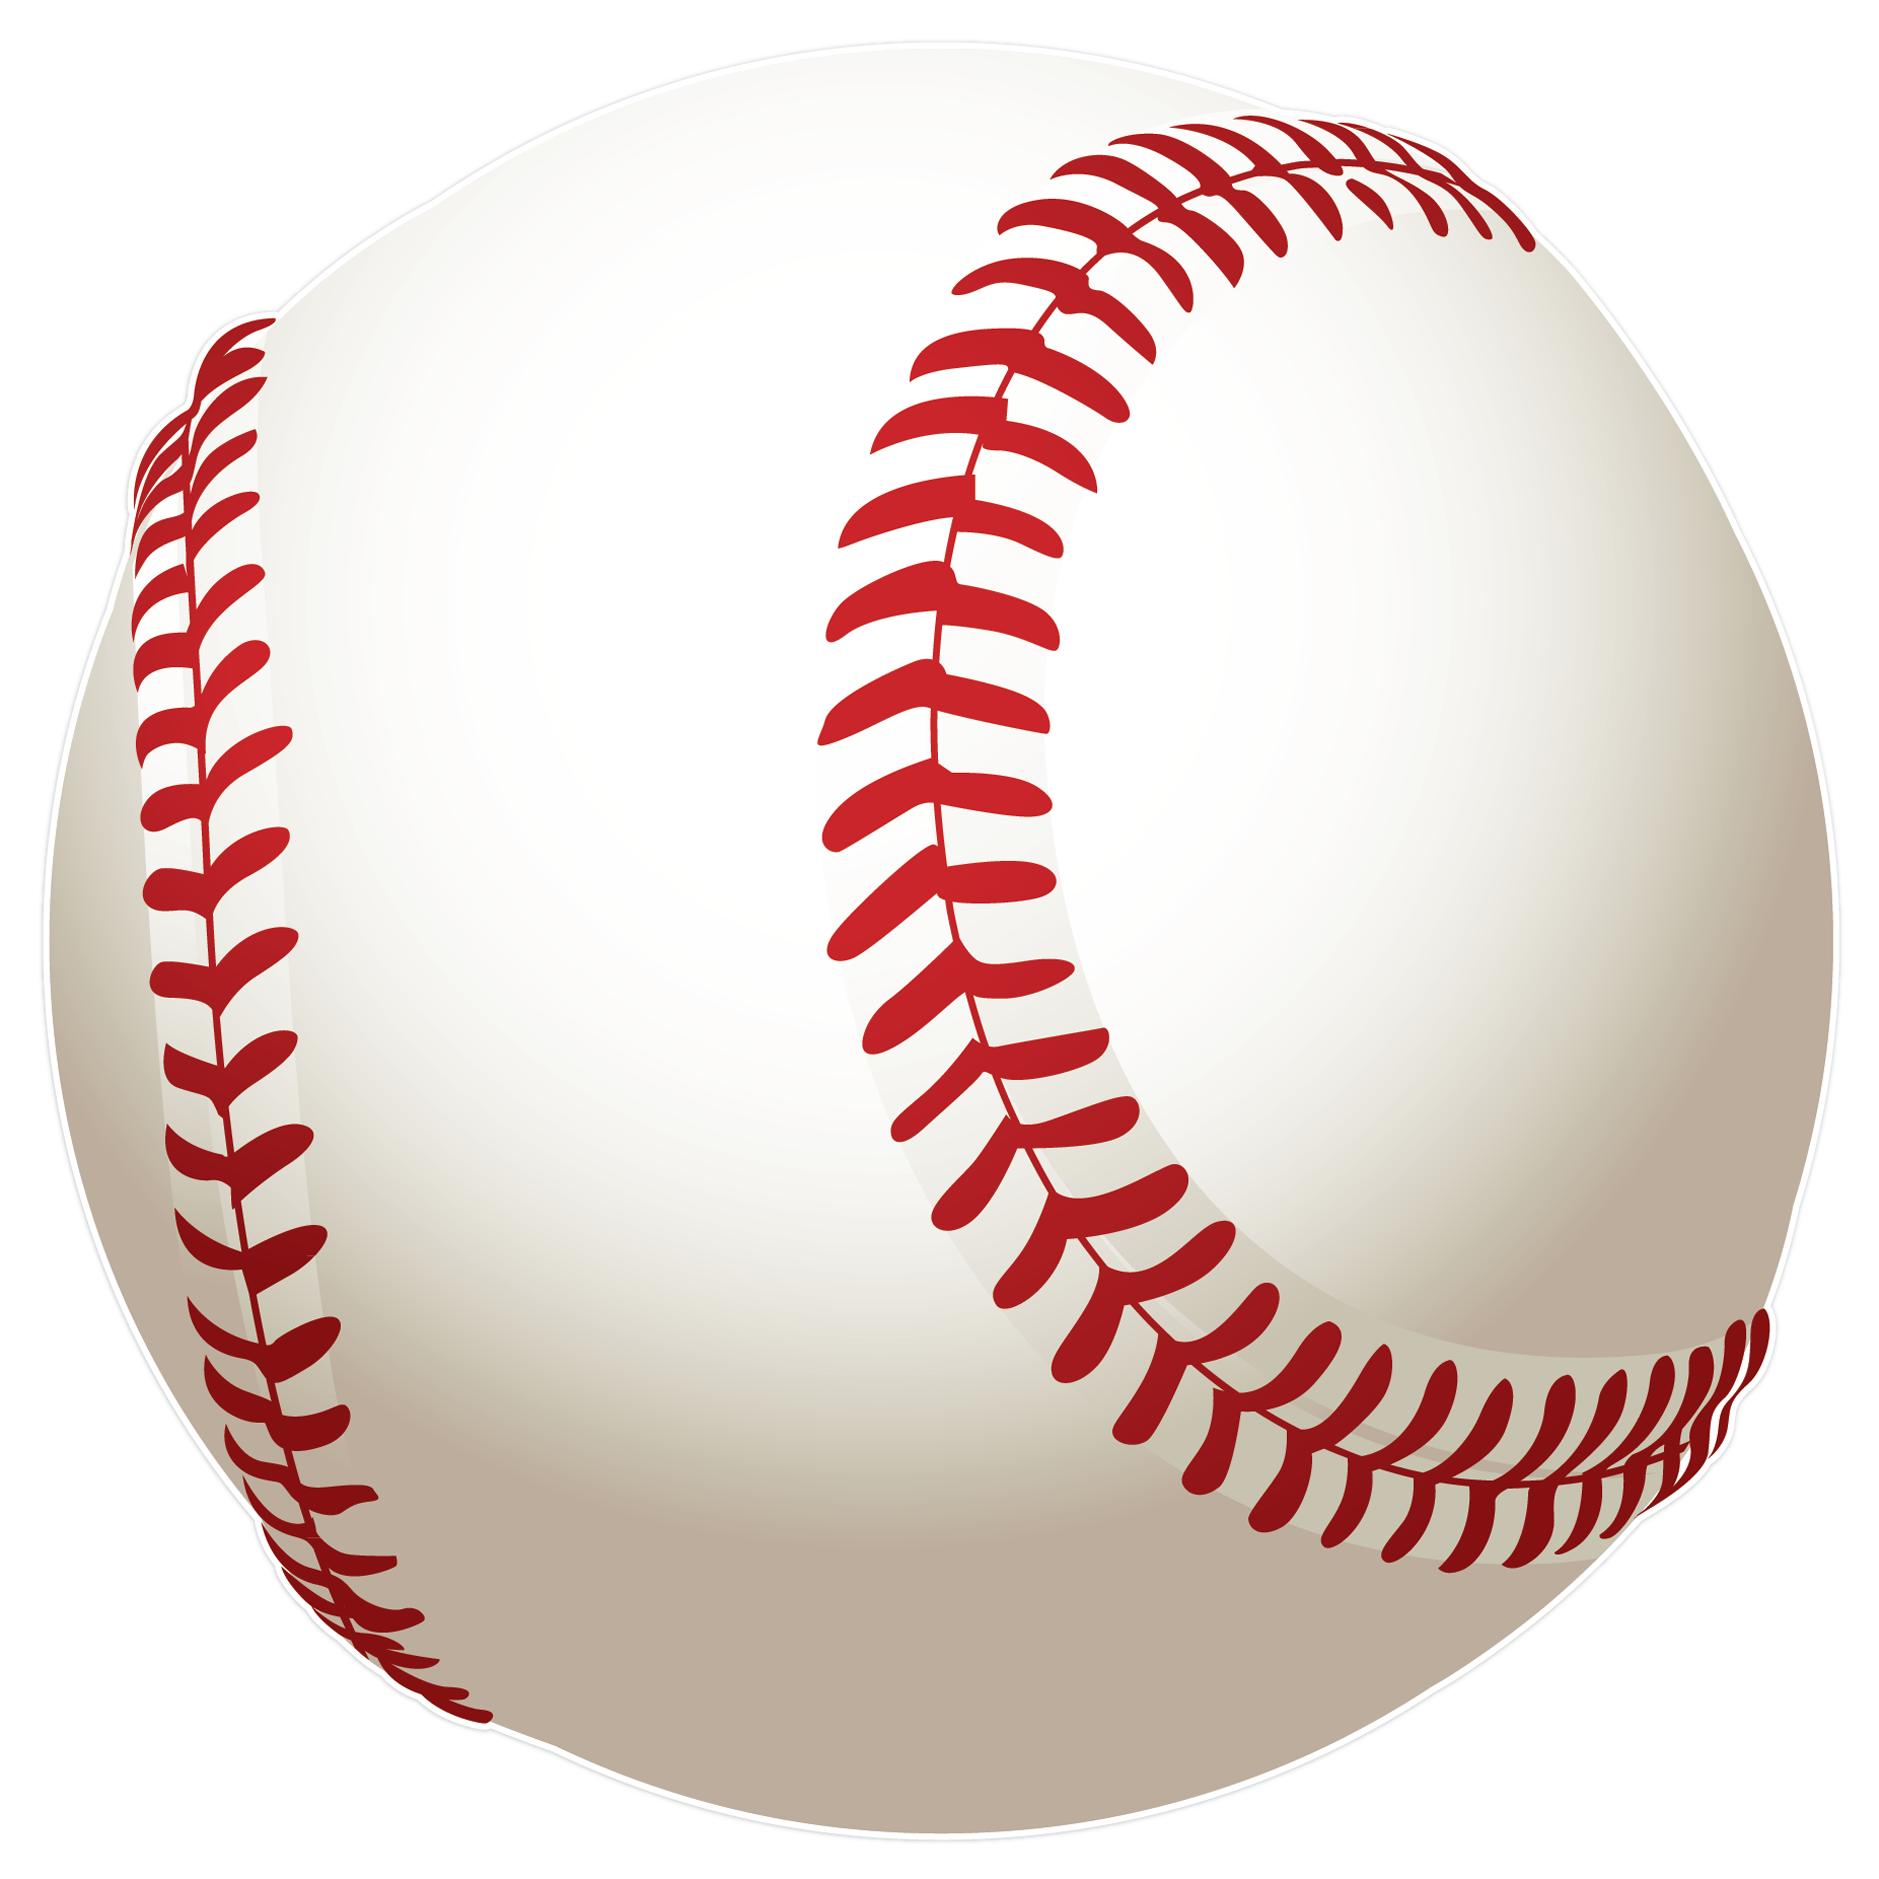 Baseball in motion clipart free Baseball Bat Hitting Ball PNG Transparent Baseball Bat Hitting Ball ... free